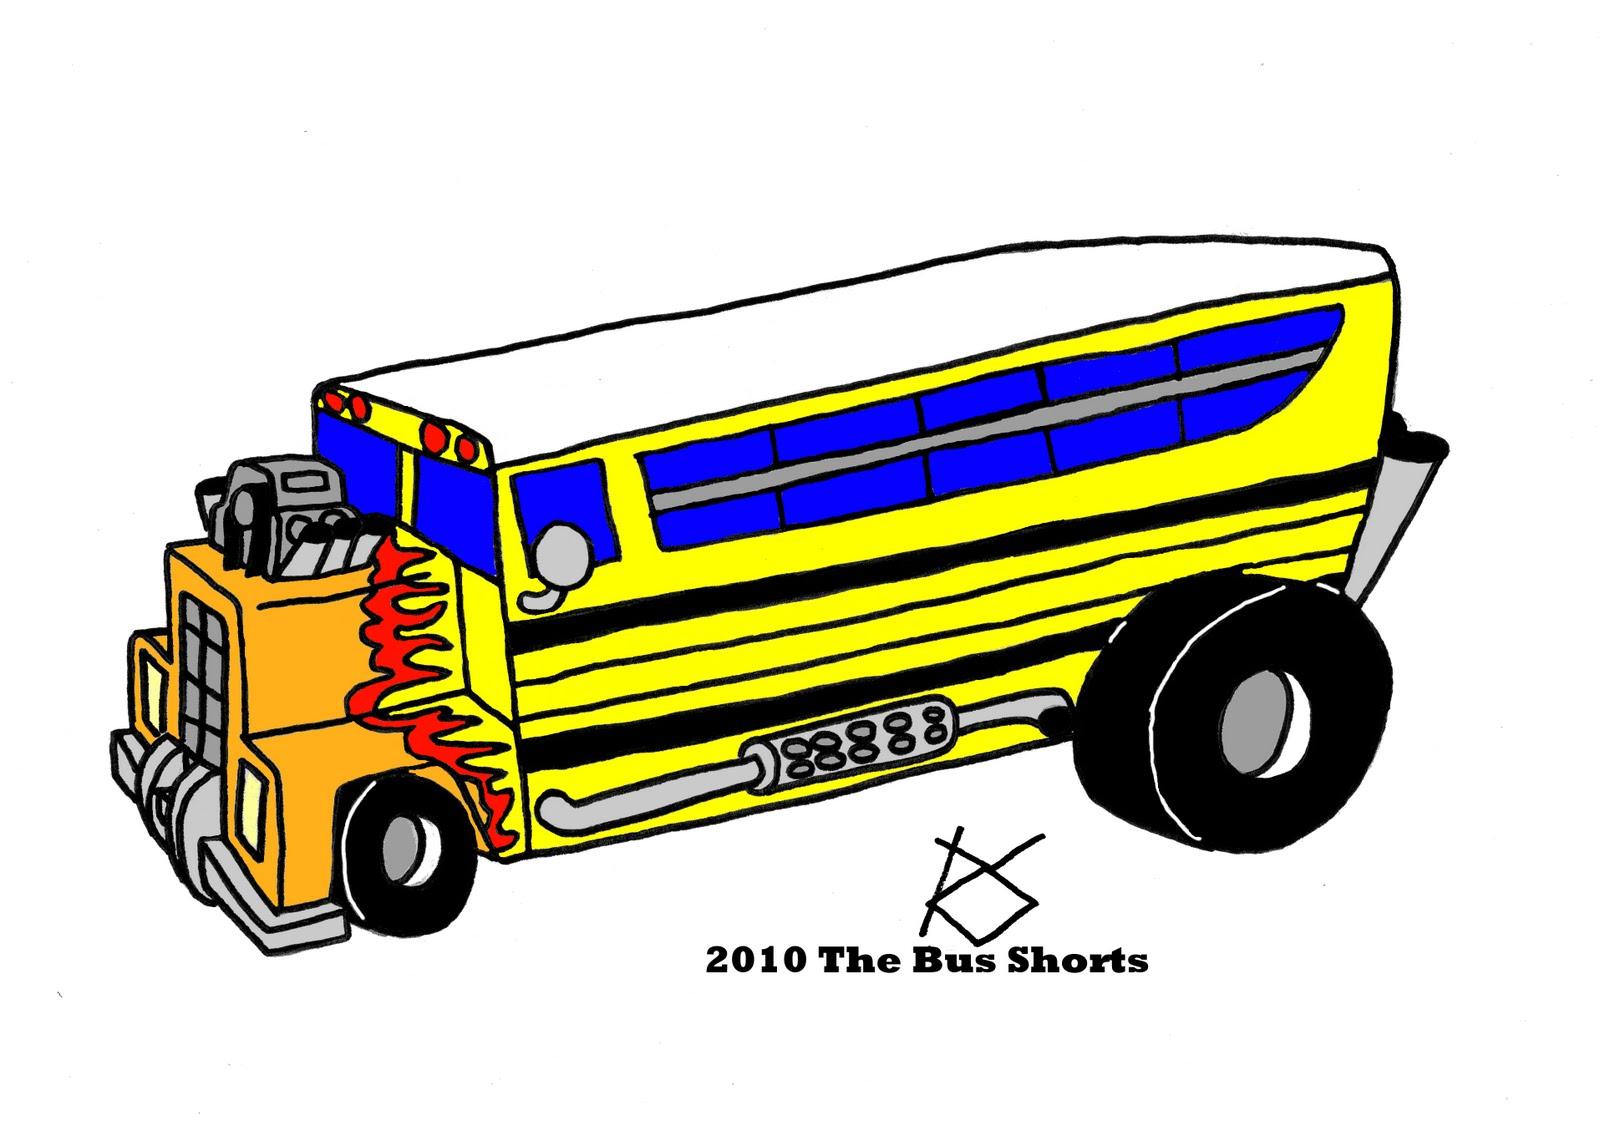 the bus shorts hot rod bus rh thebusshorts blogspot com Hot Rod Car Clip Art Hot Rod Boat Clip Art